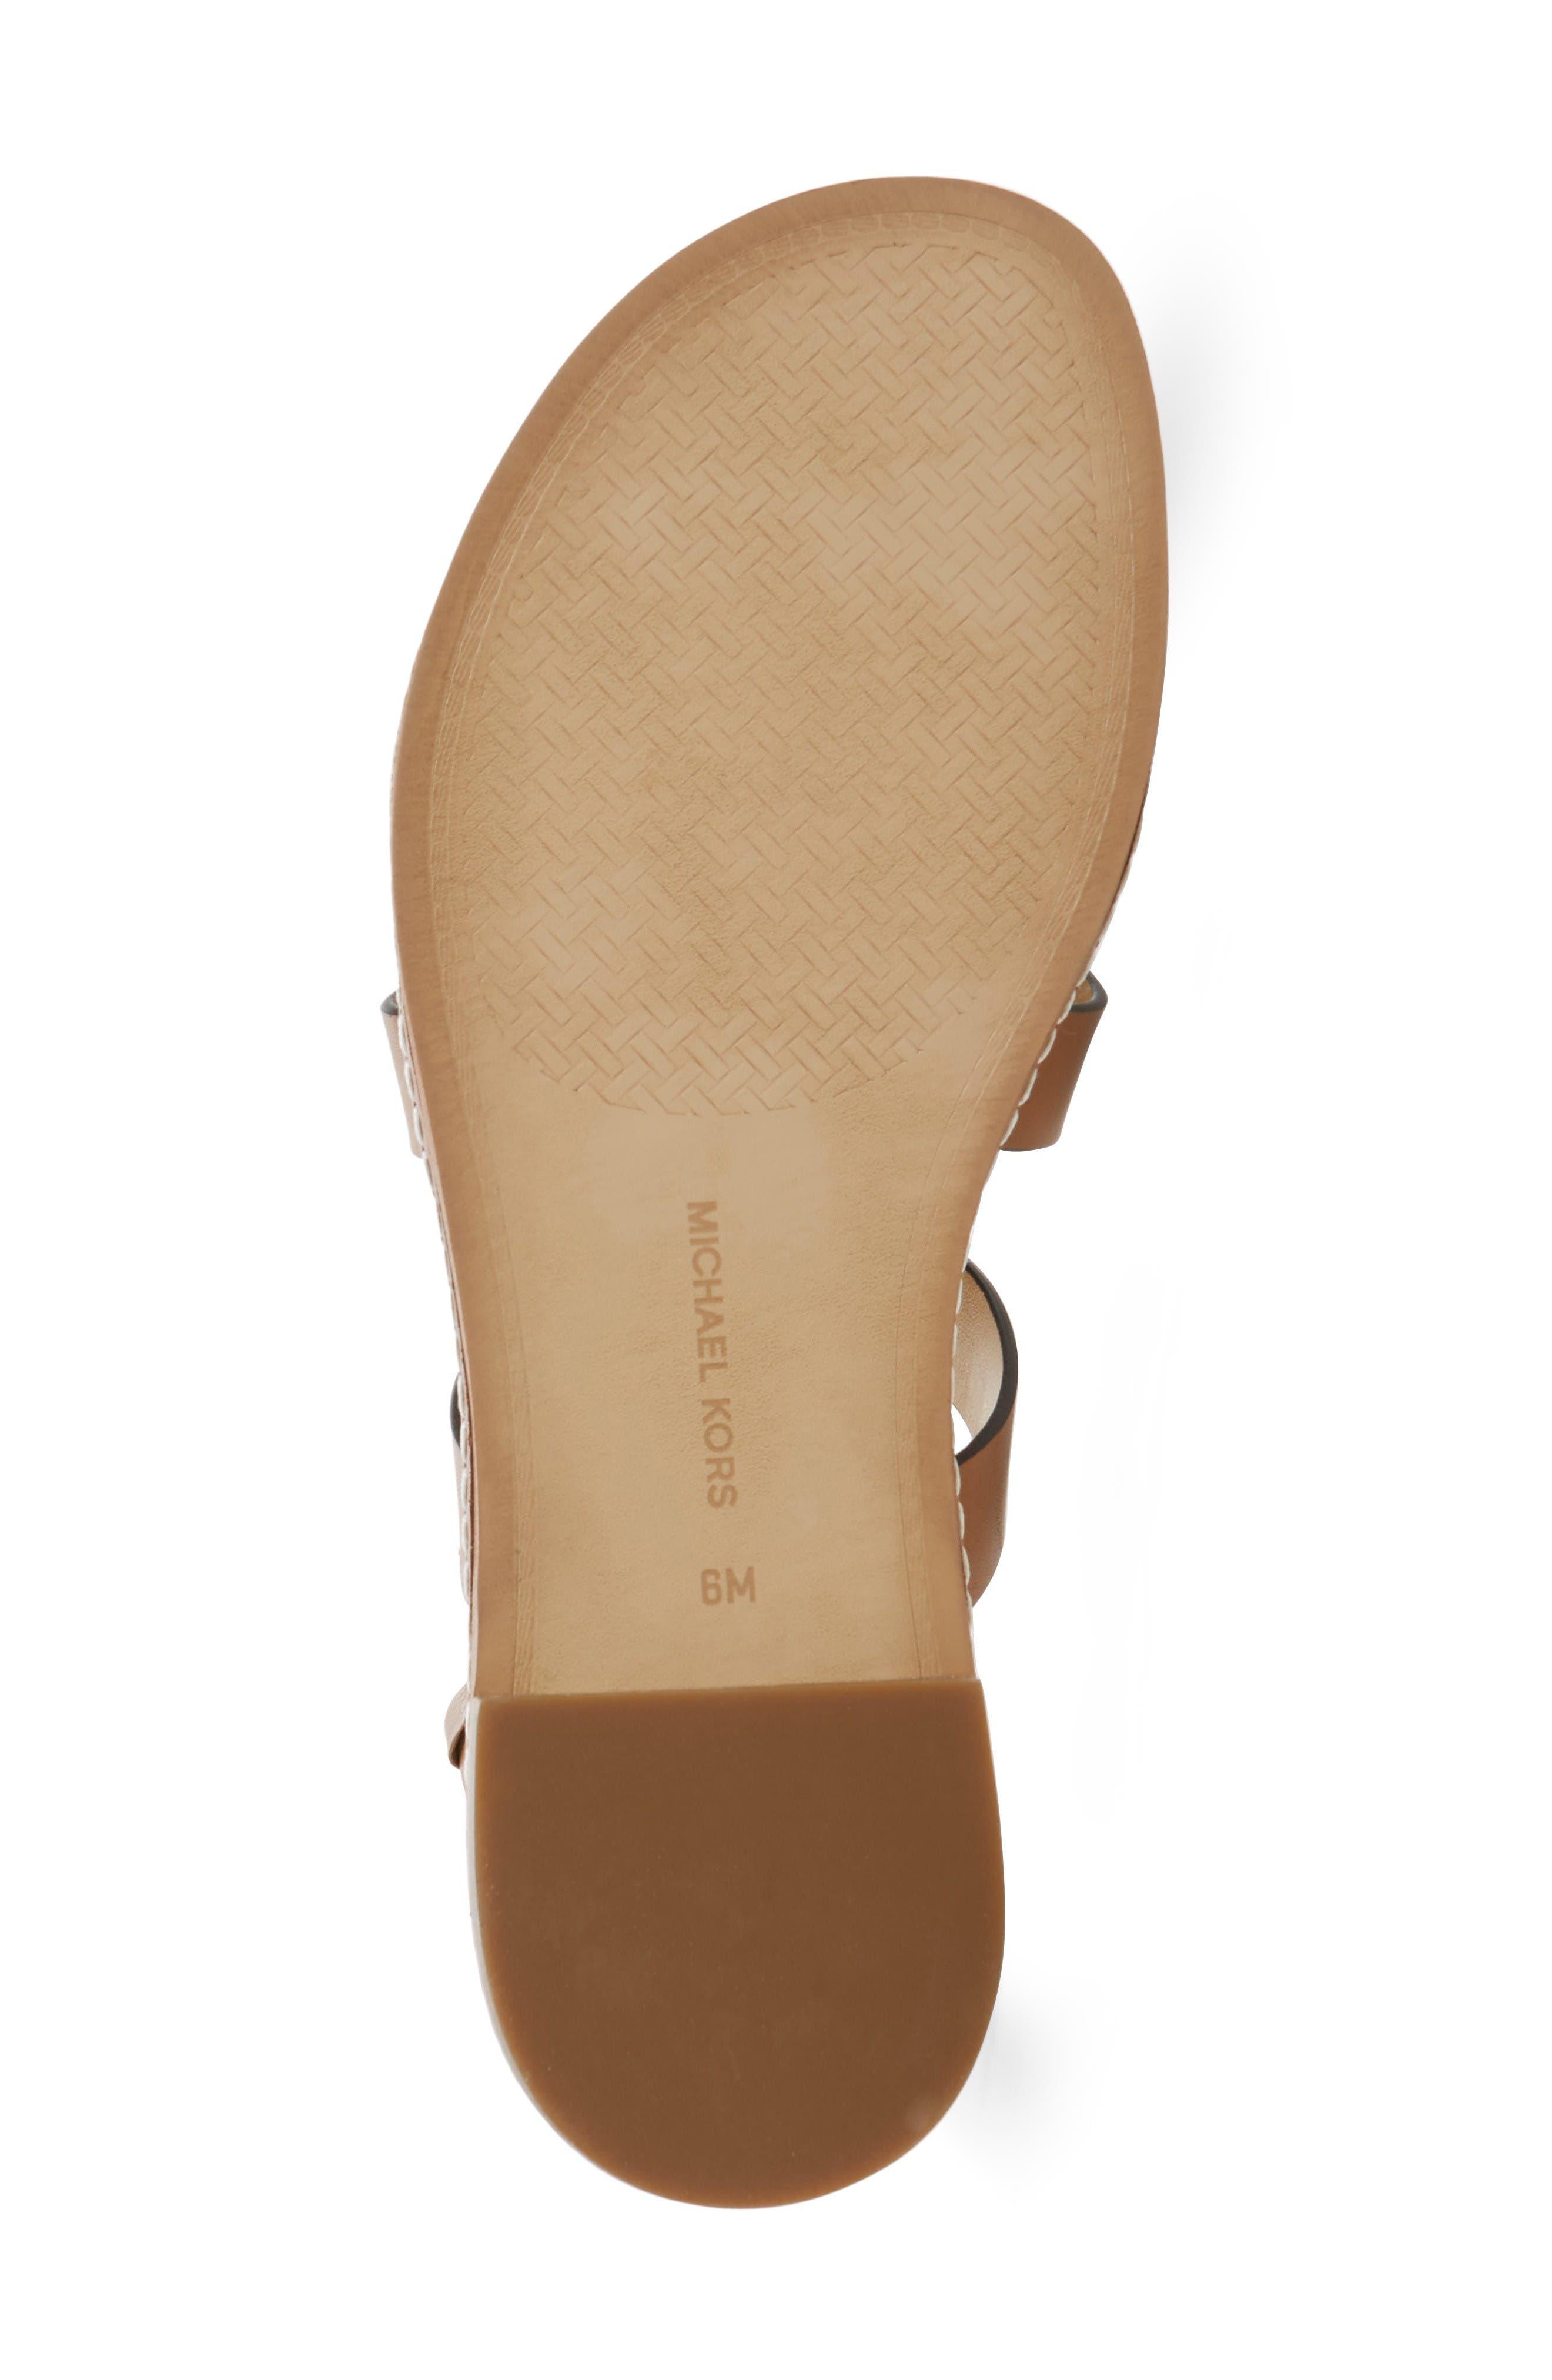 Fallon Gladiator Sandal,                             Alternate thumbnail 6, color,                             Acorn/ White Leather